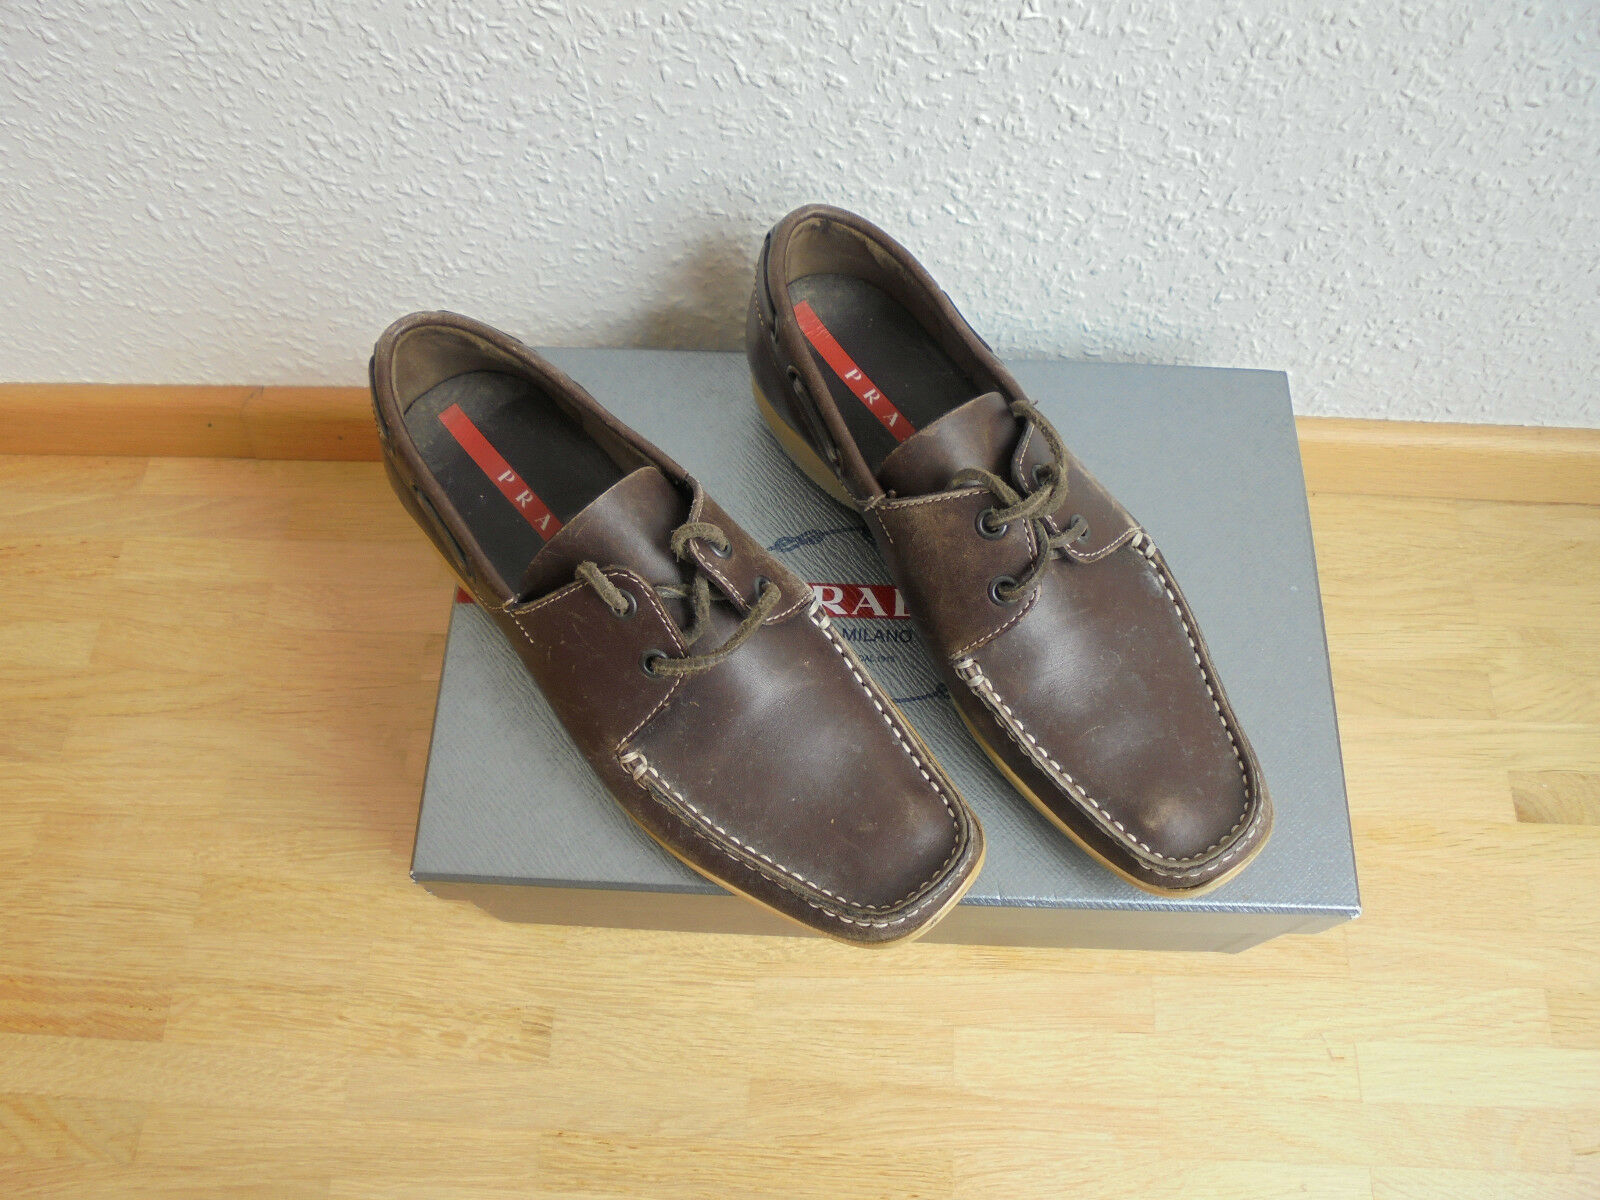 Prada Leder Segelschuhe NP  Slipper Loafer Schuhe Pumps Mokassins 36 36,5 37